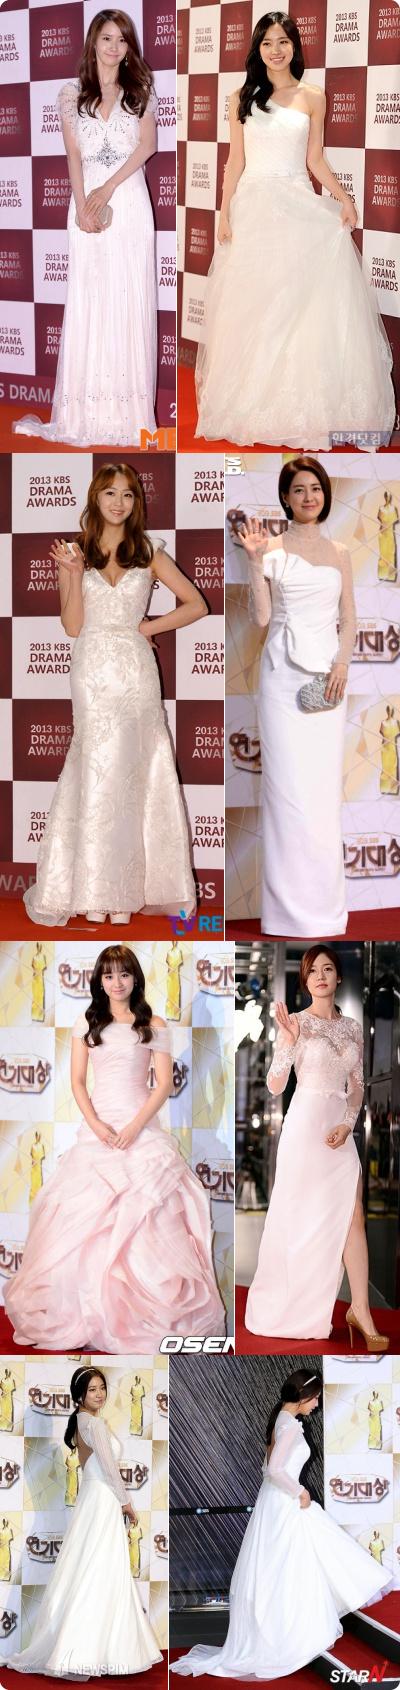 「KBS・SBS・MBC演技大賞」の中スター達のドレスファッション